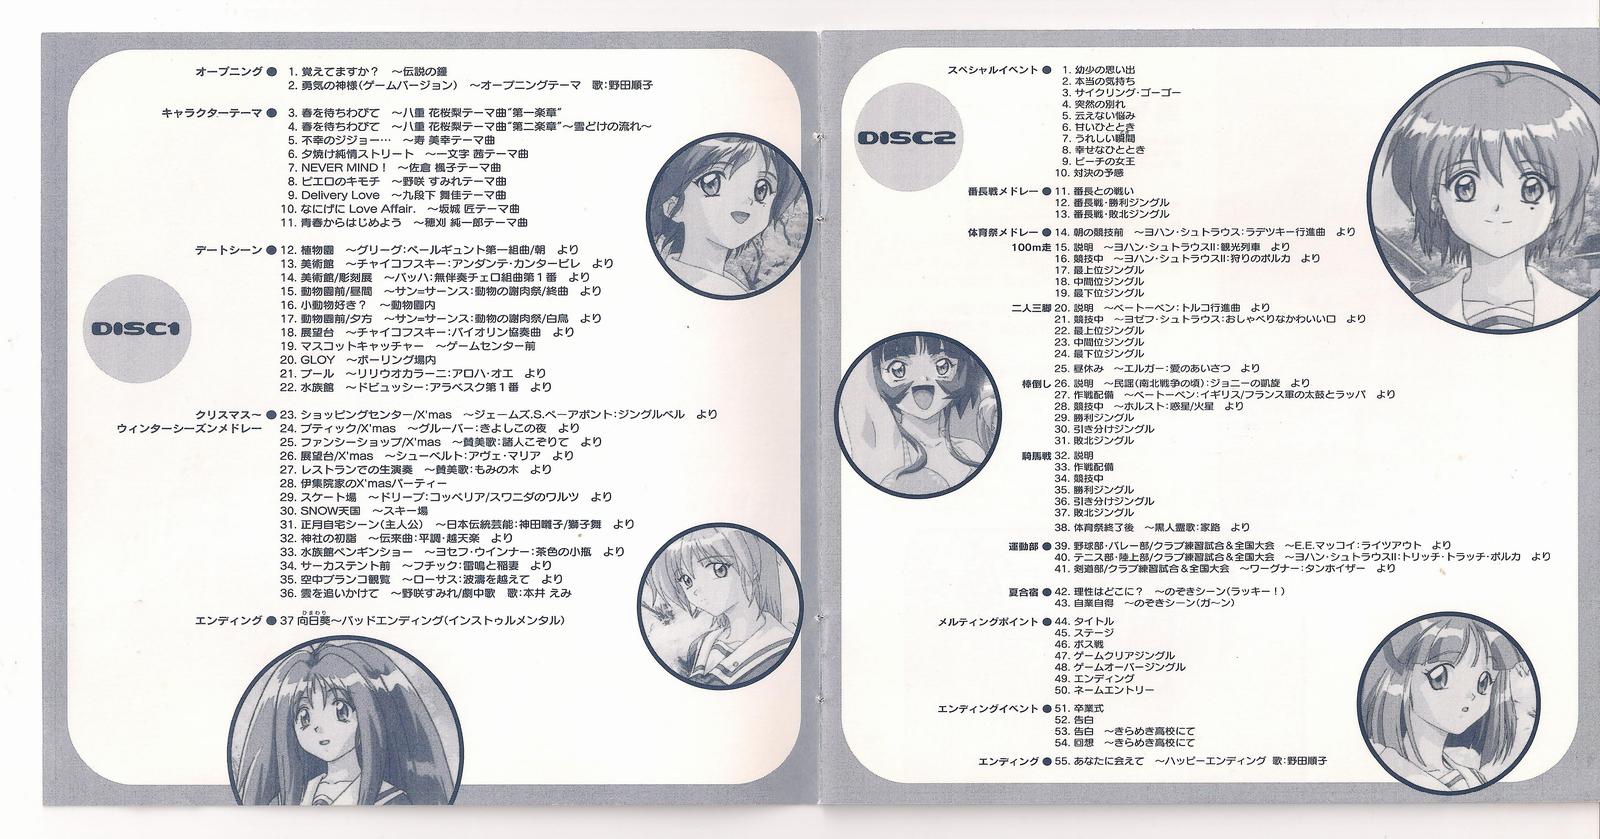 Tokimeki Memorial 2 Original Game Soundtrack Vol 2 Mp3